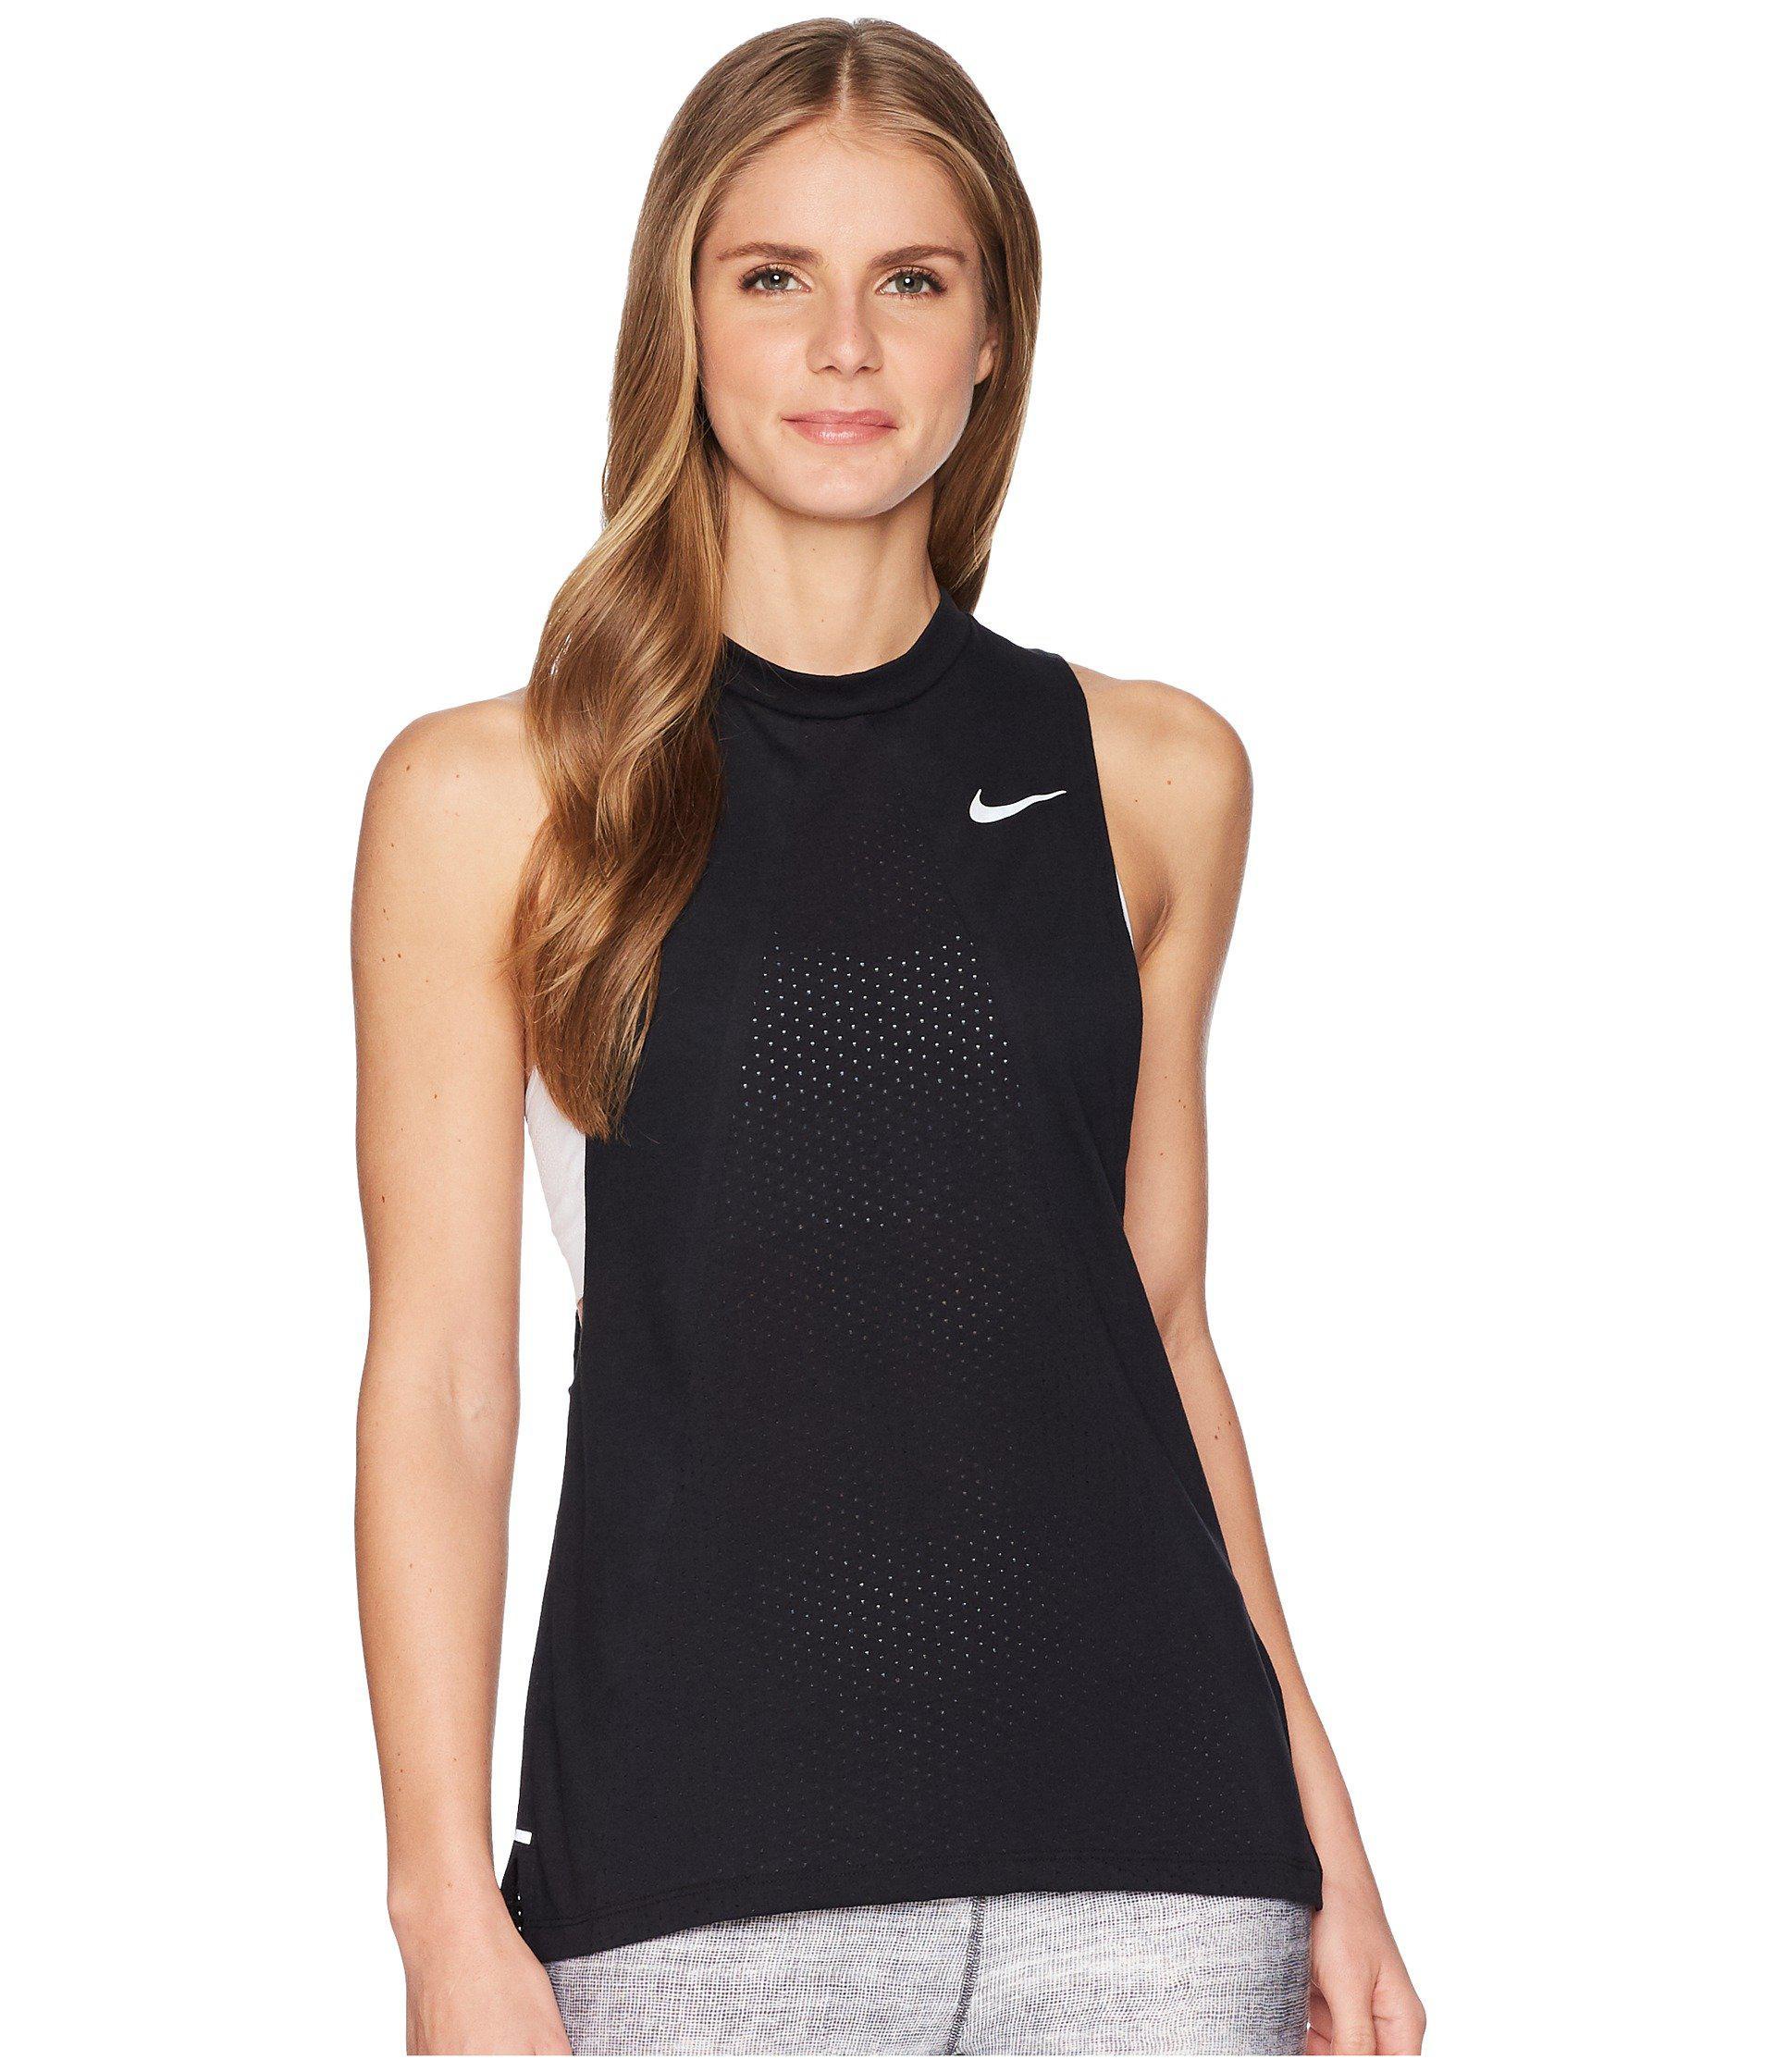 e0d7cc93a4 Nike Breathe Tailwind Tank Top Cool in Black - Lyst